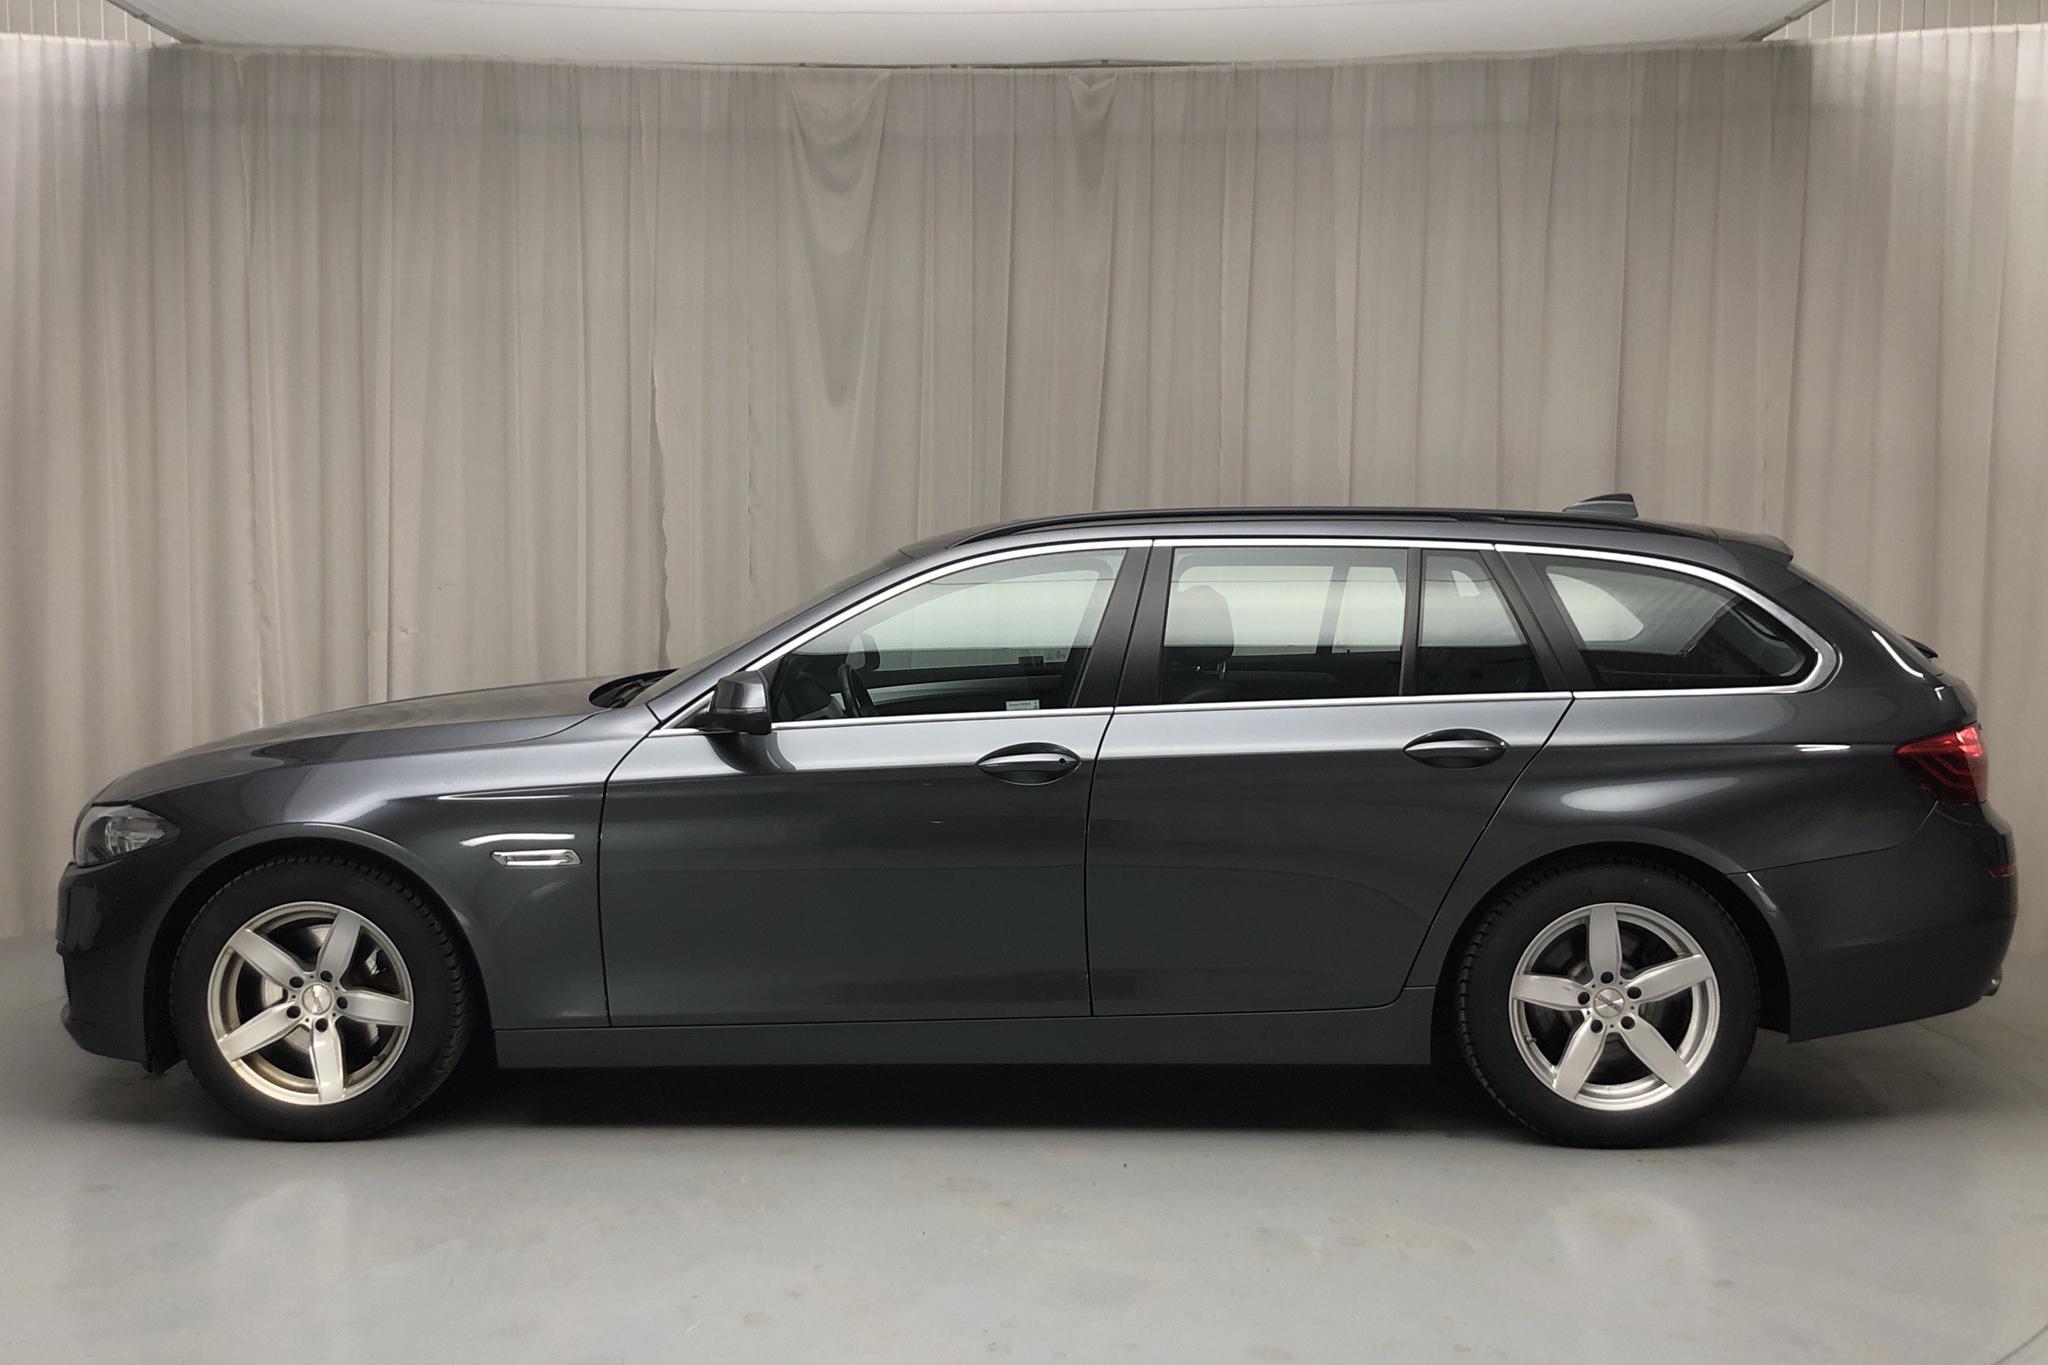 BMW 520d xDrive Touring, F11 (190hk) - 6 078 mil - Automat - grå - 2017